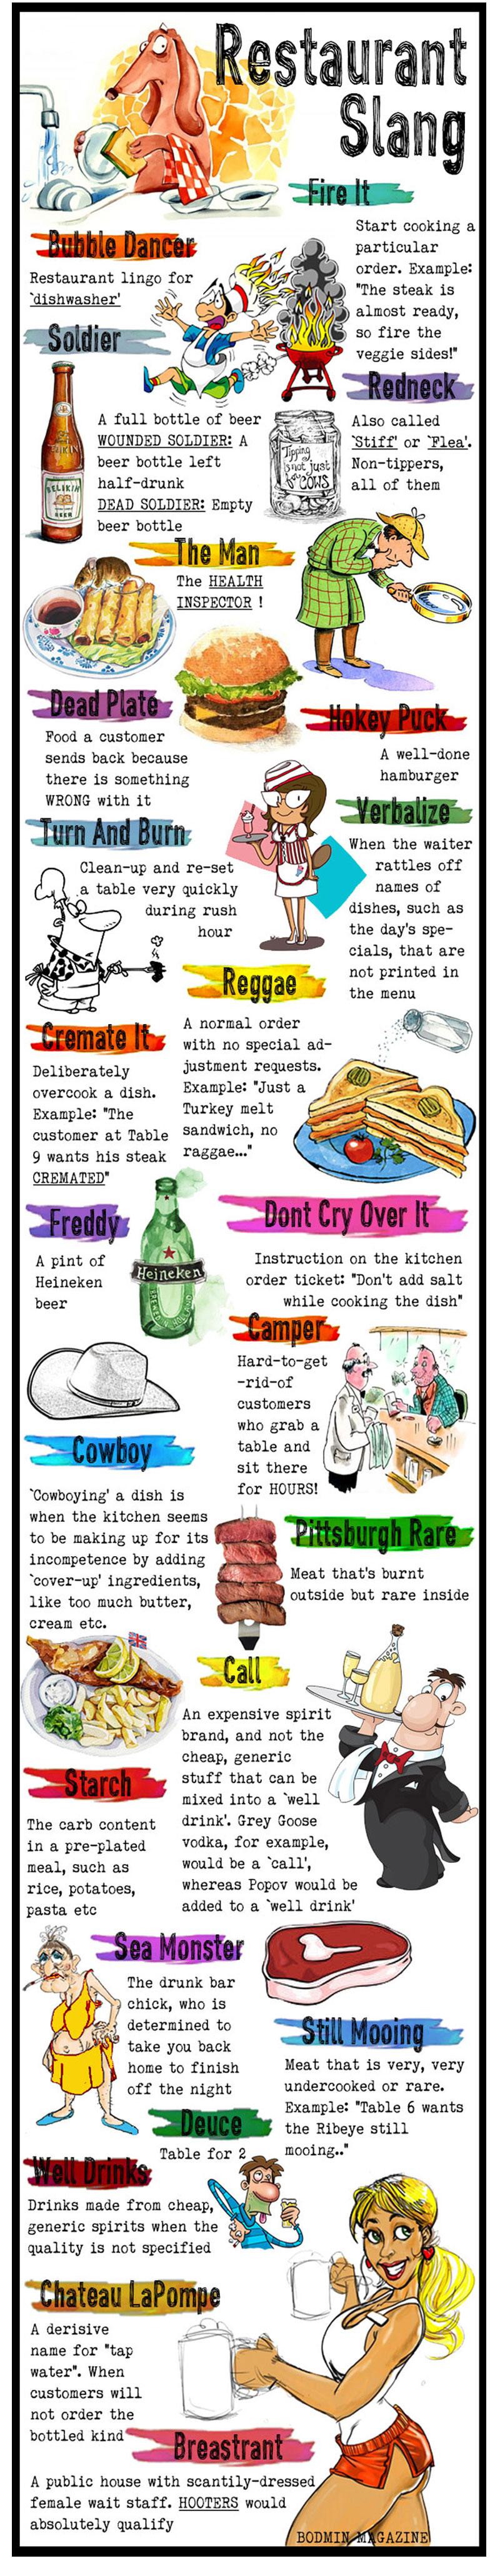 Glossary-of-bar-and-restaurant-slang-lingo